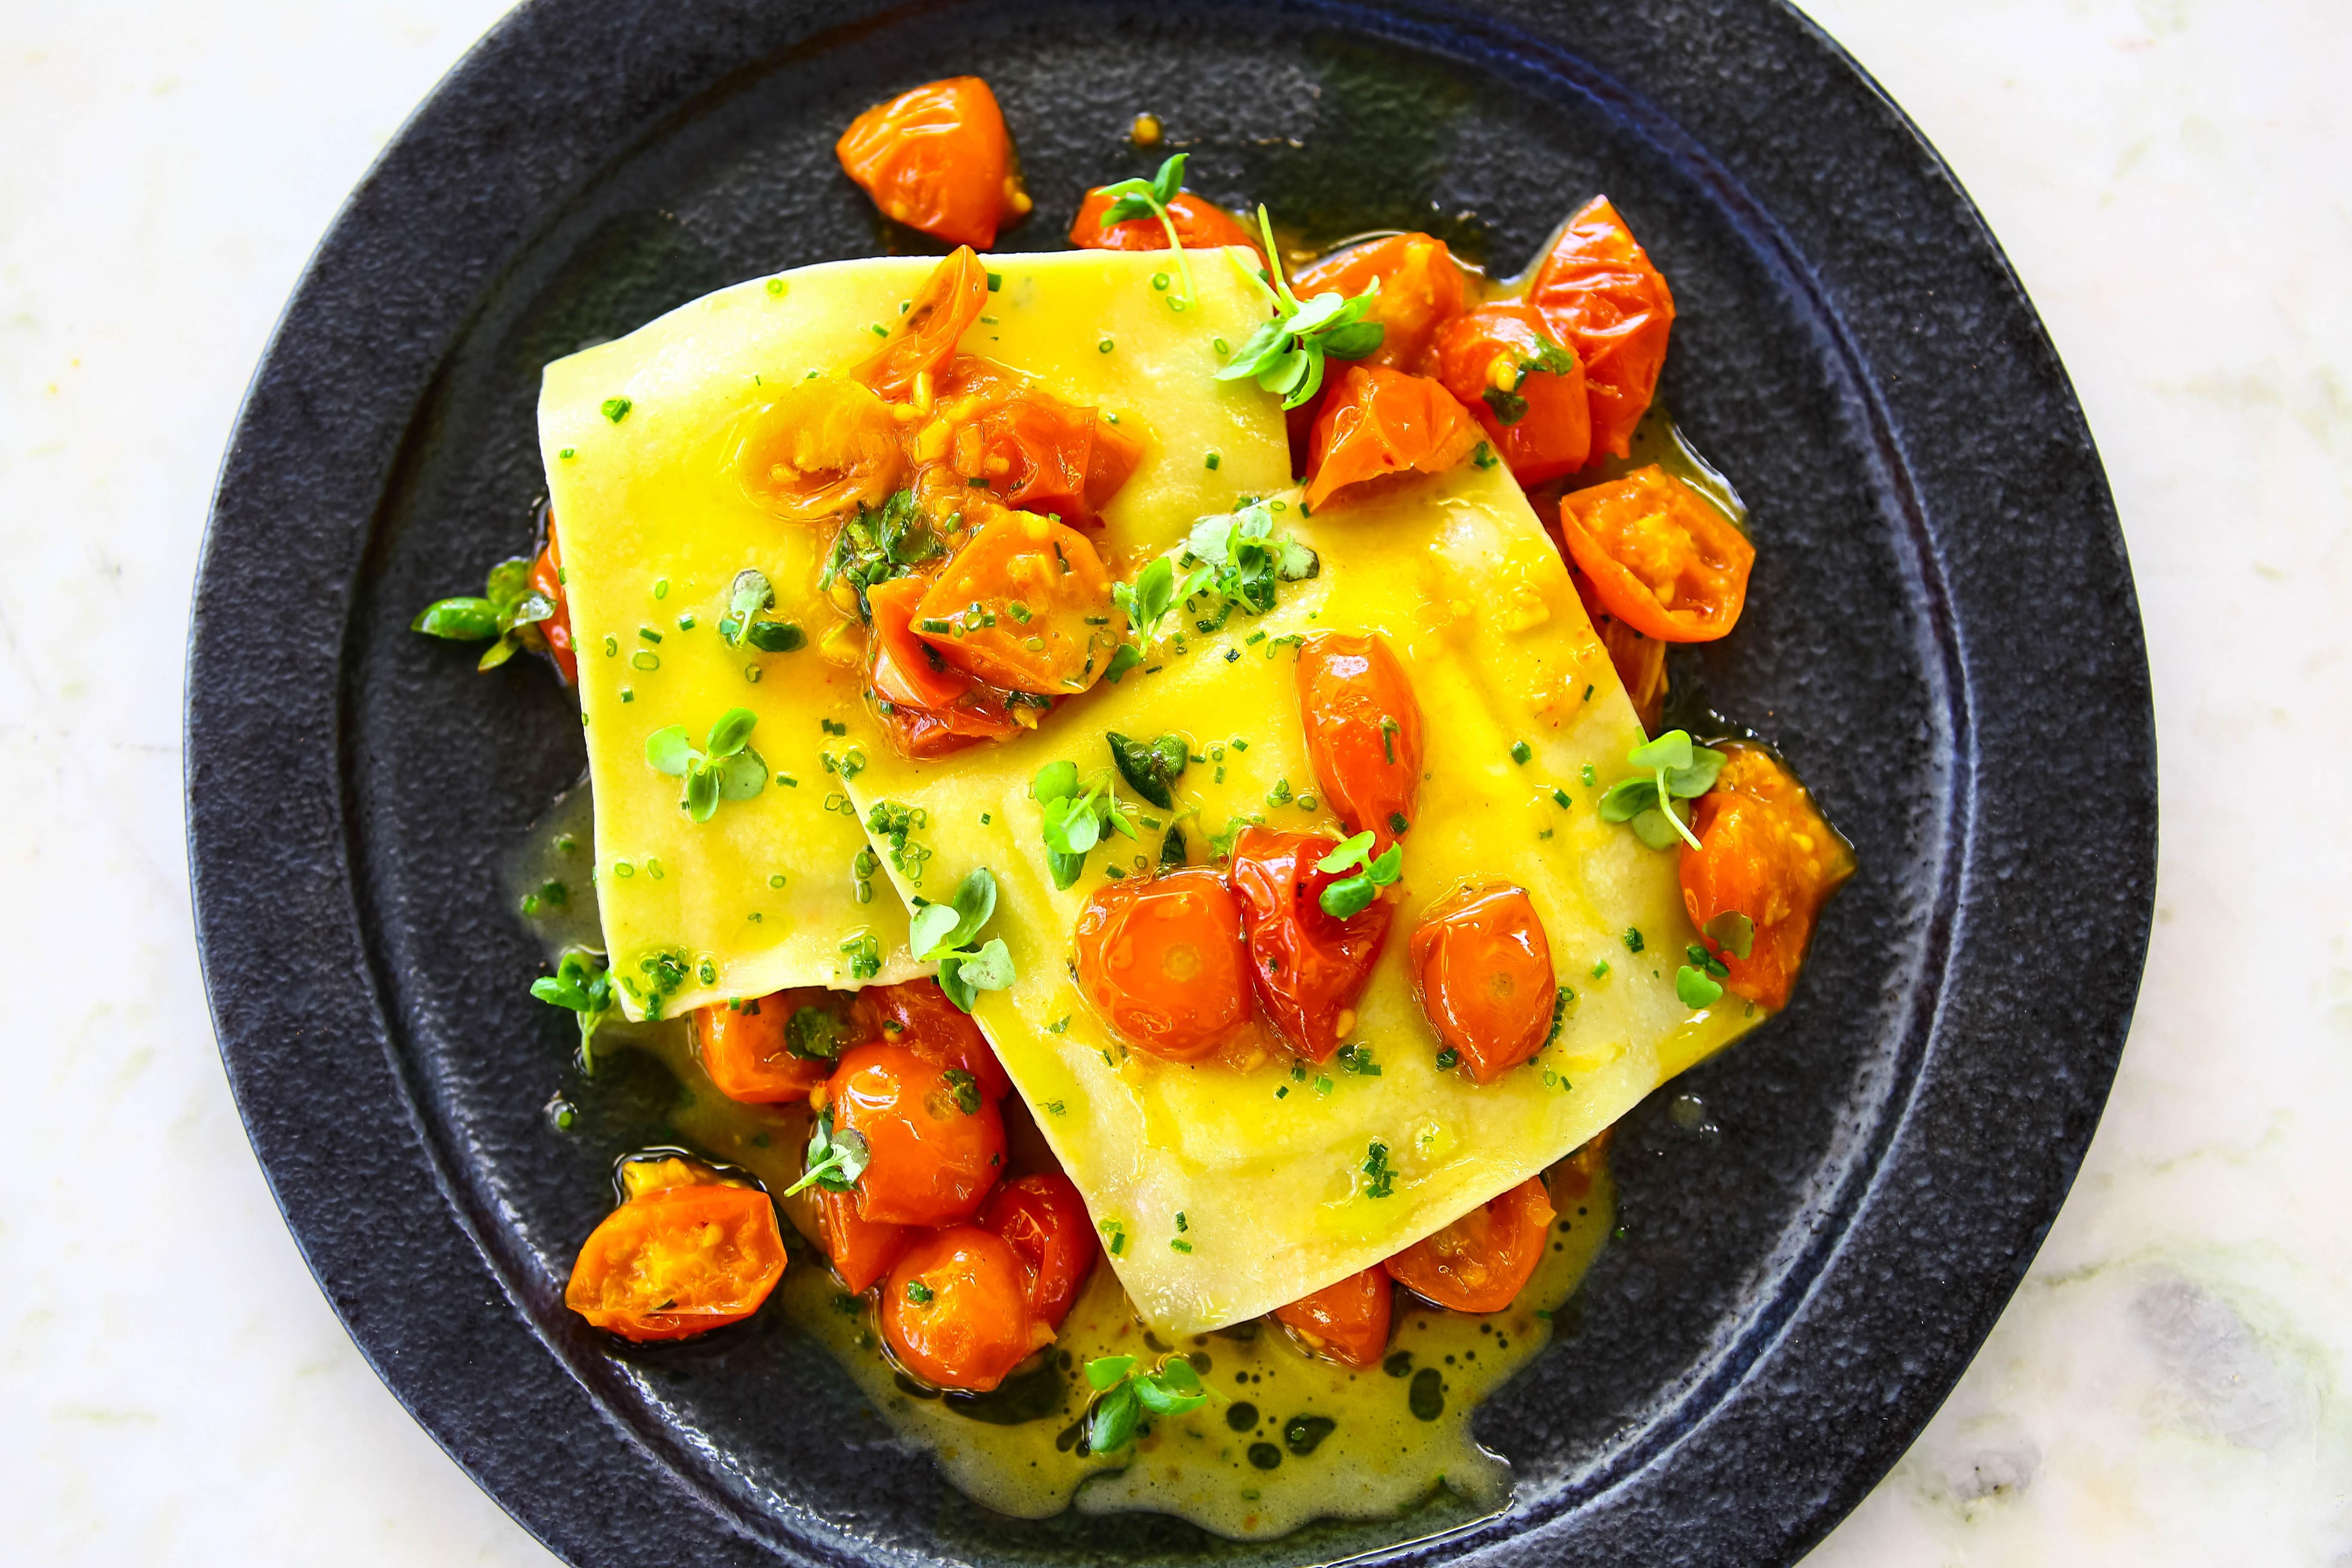 Restaurant Review: All'Onda